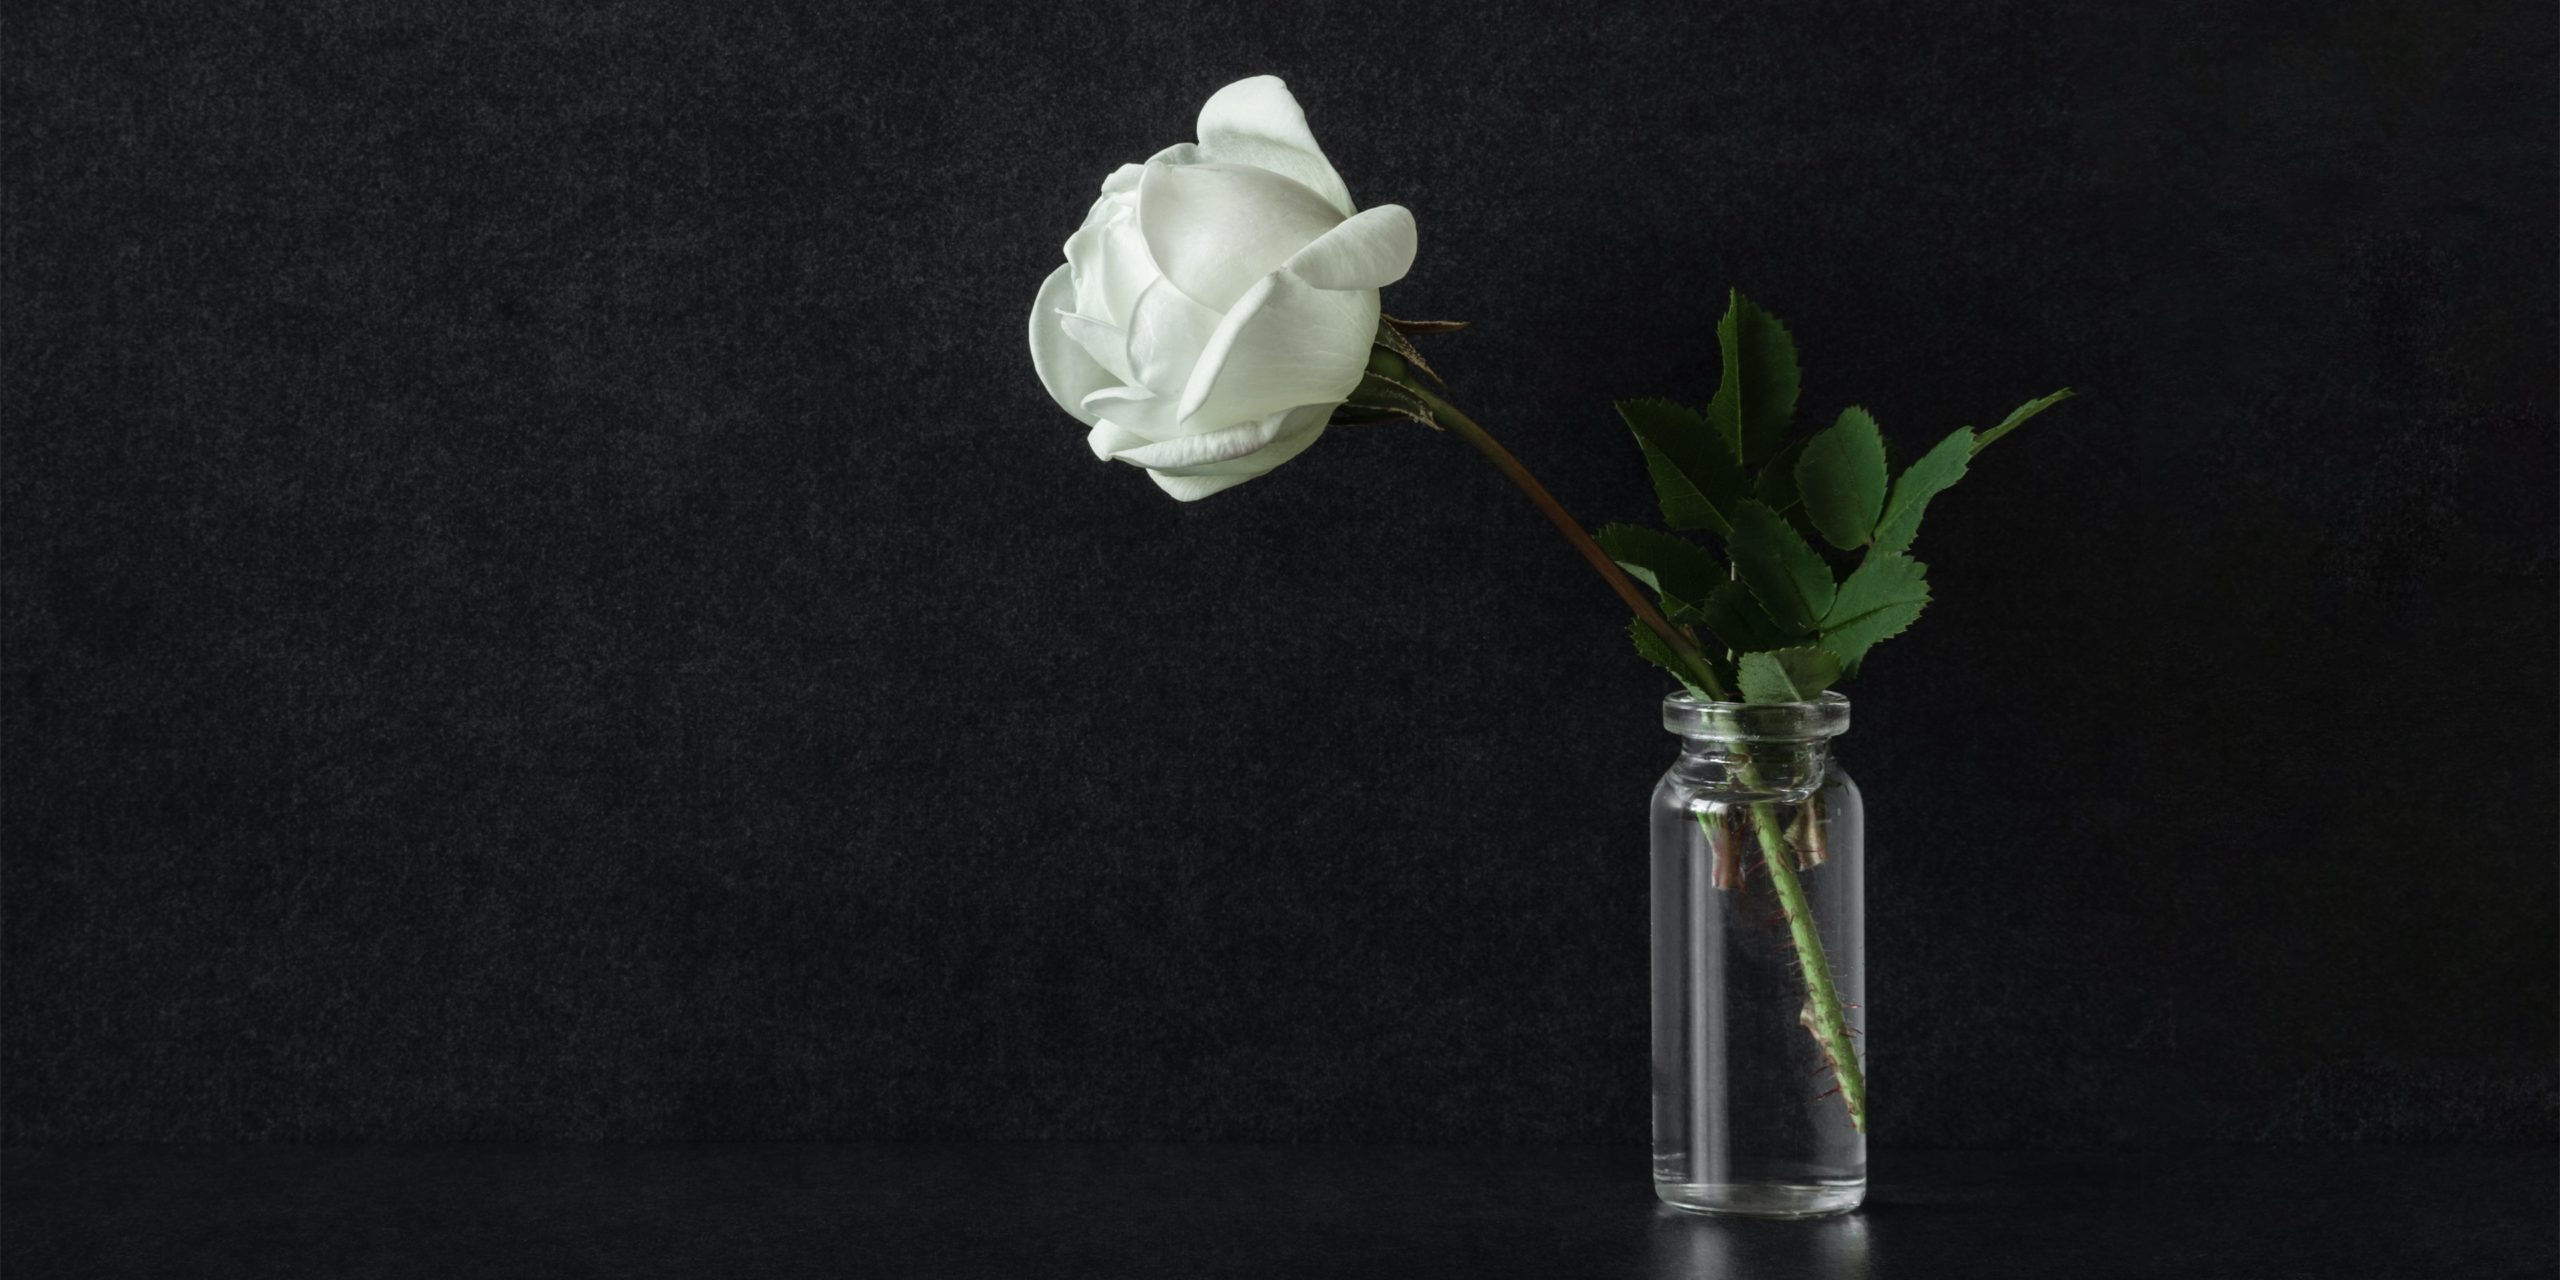 white rose, mourning